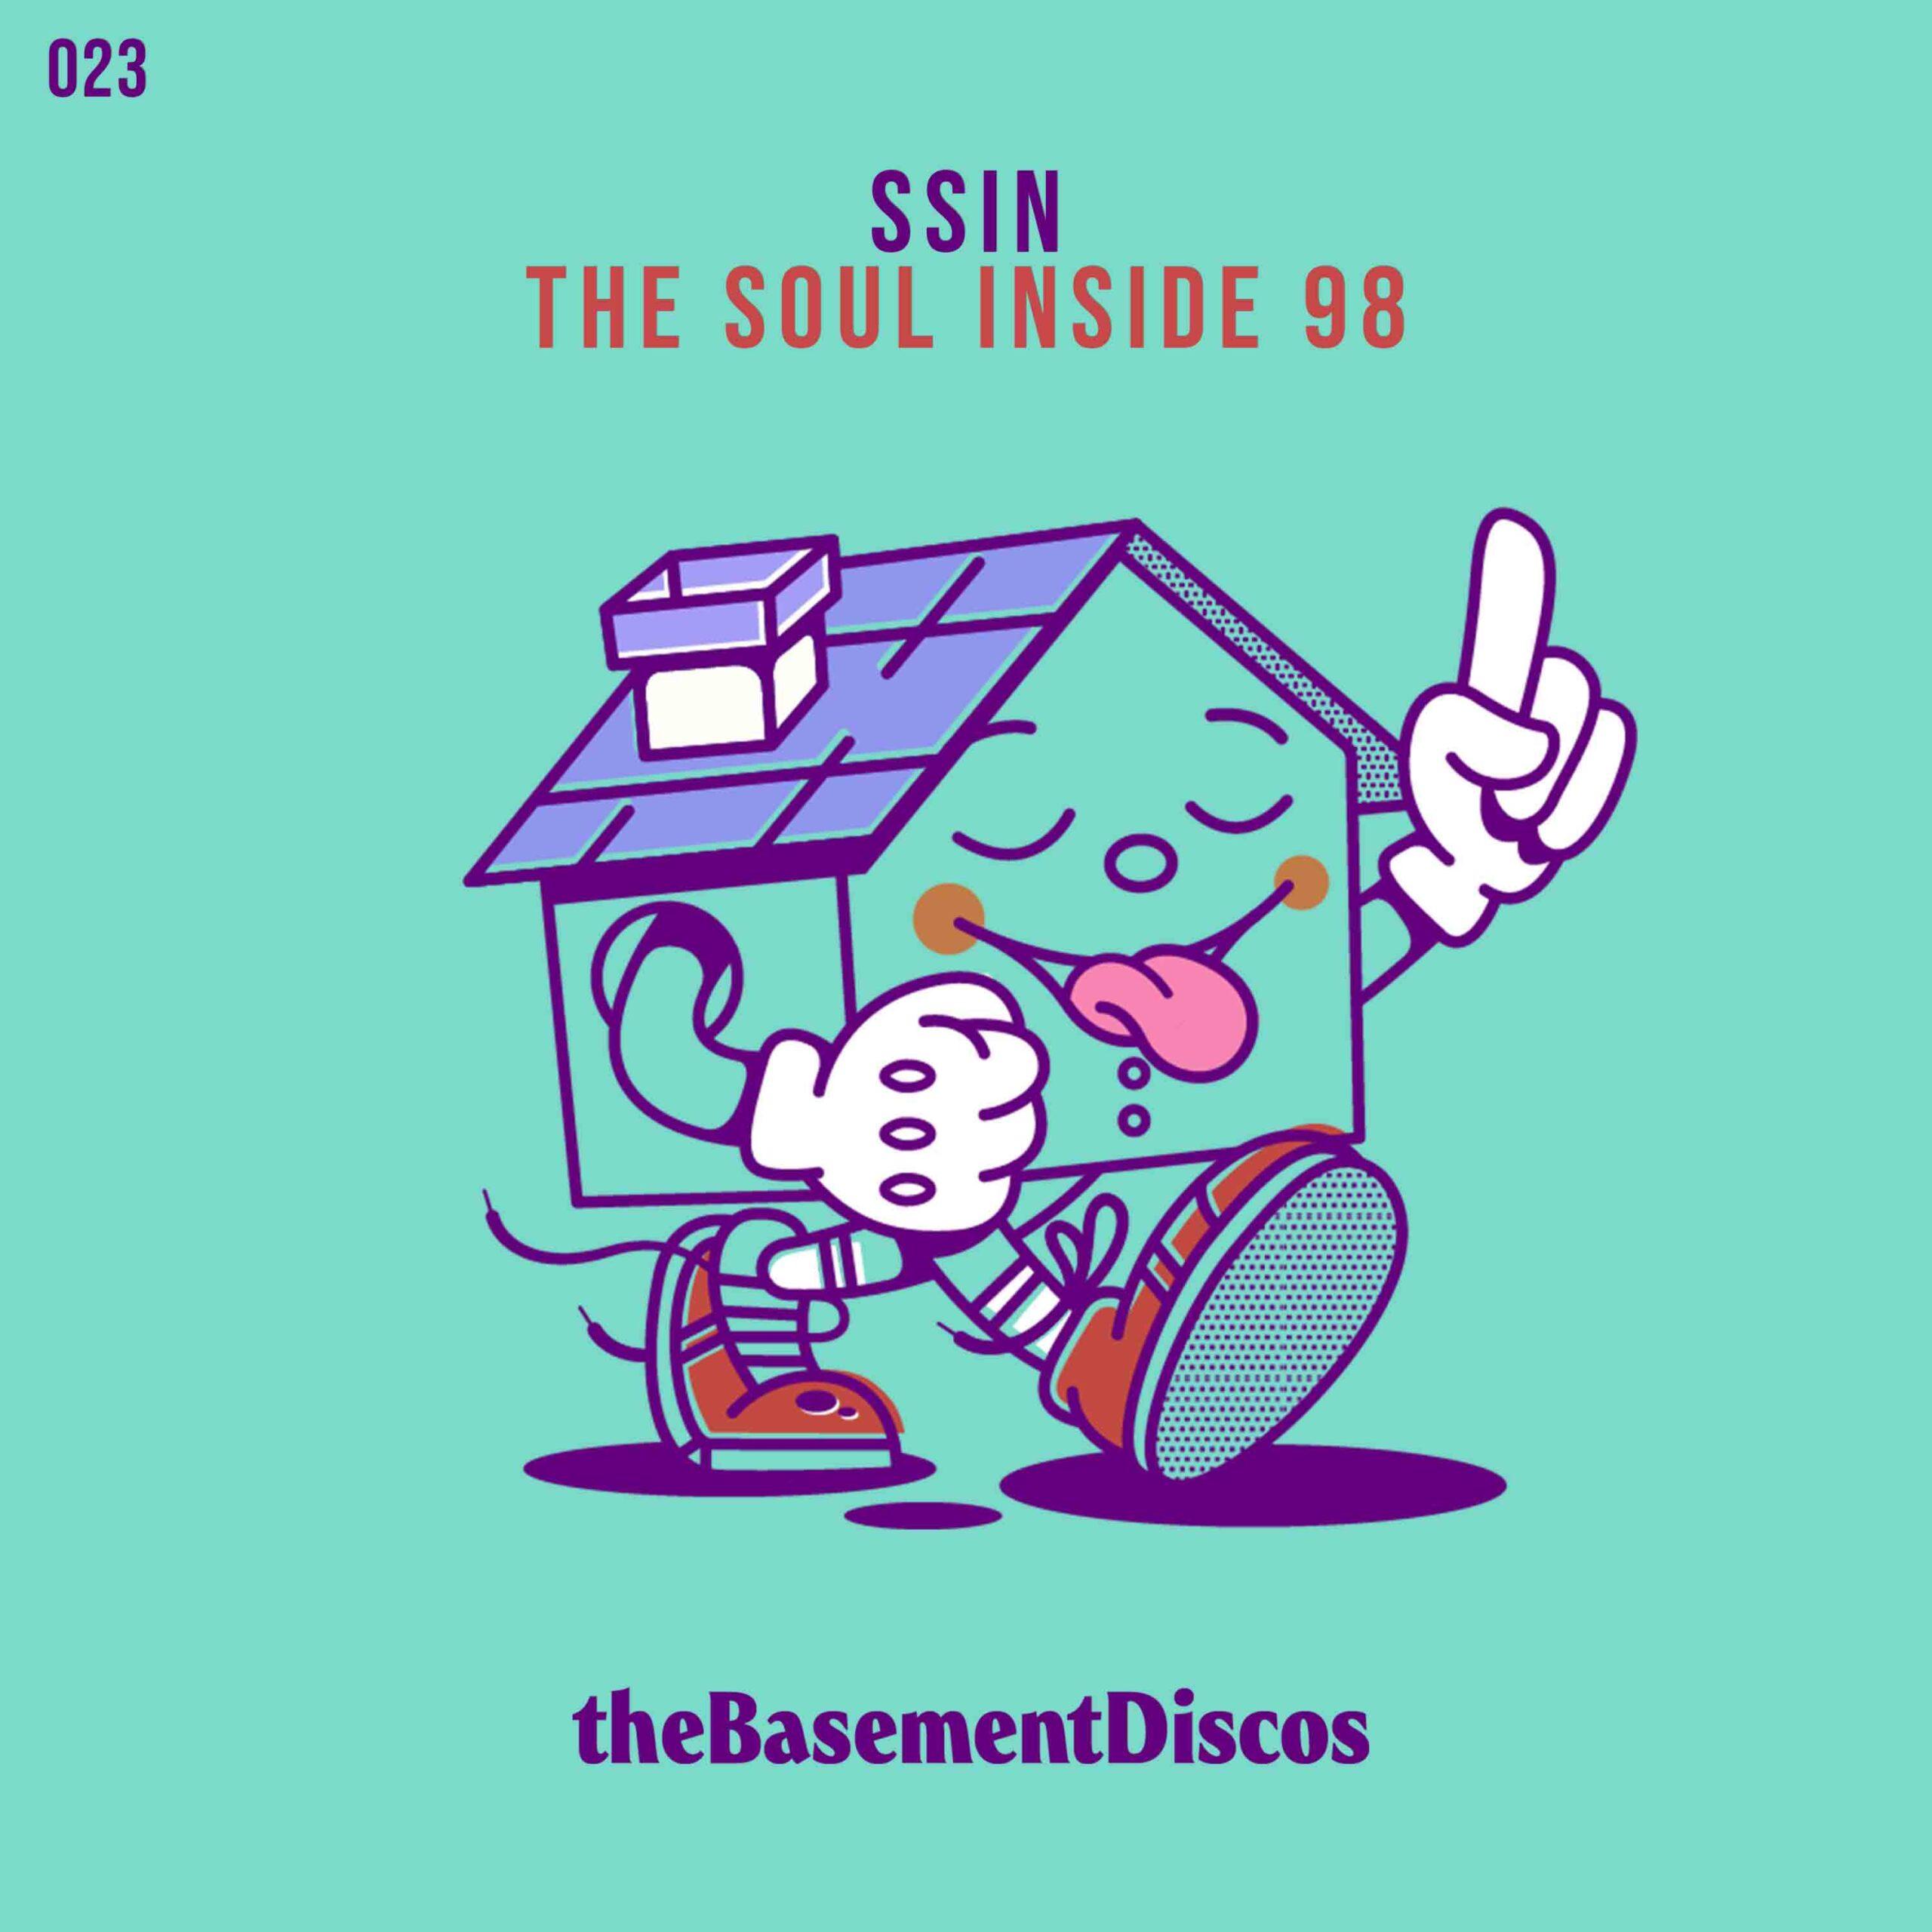 the-basement-thebasement-thebasementdiscos-ssin-the-soul-inside-98-valencia-dj-disco-house-good-feelings-portada